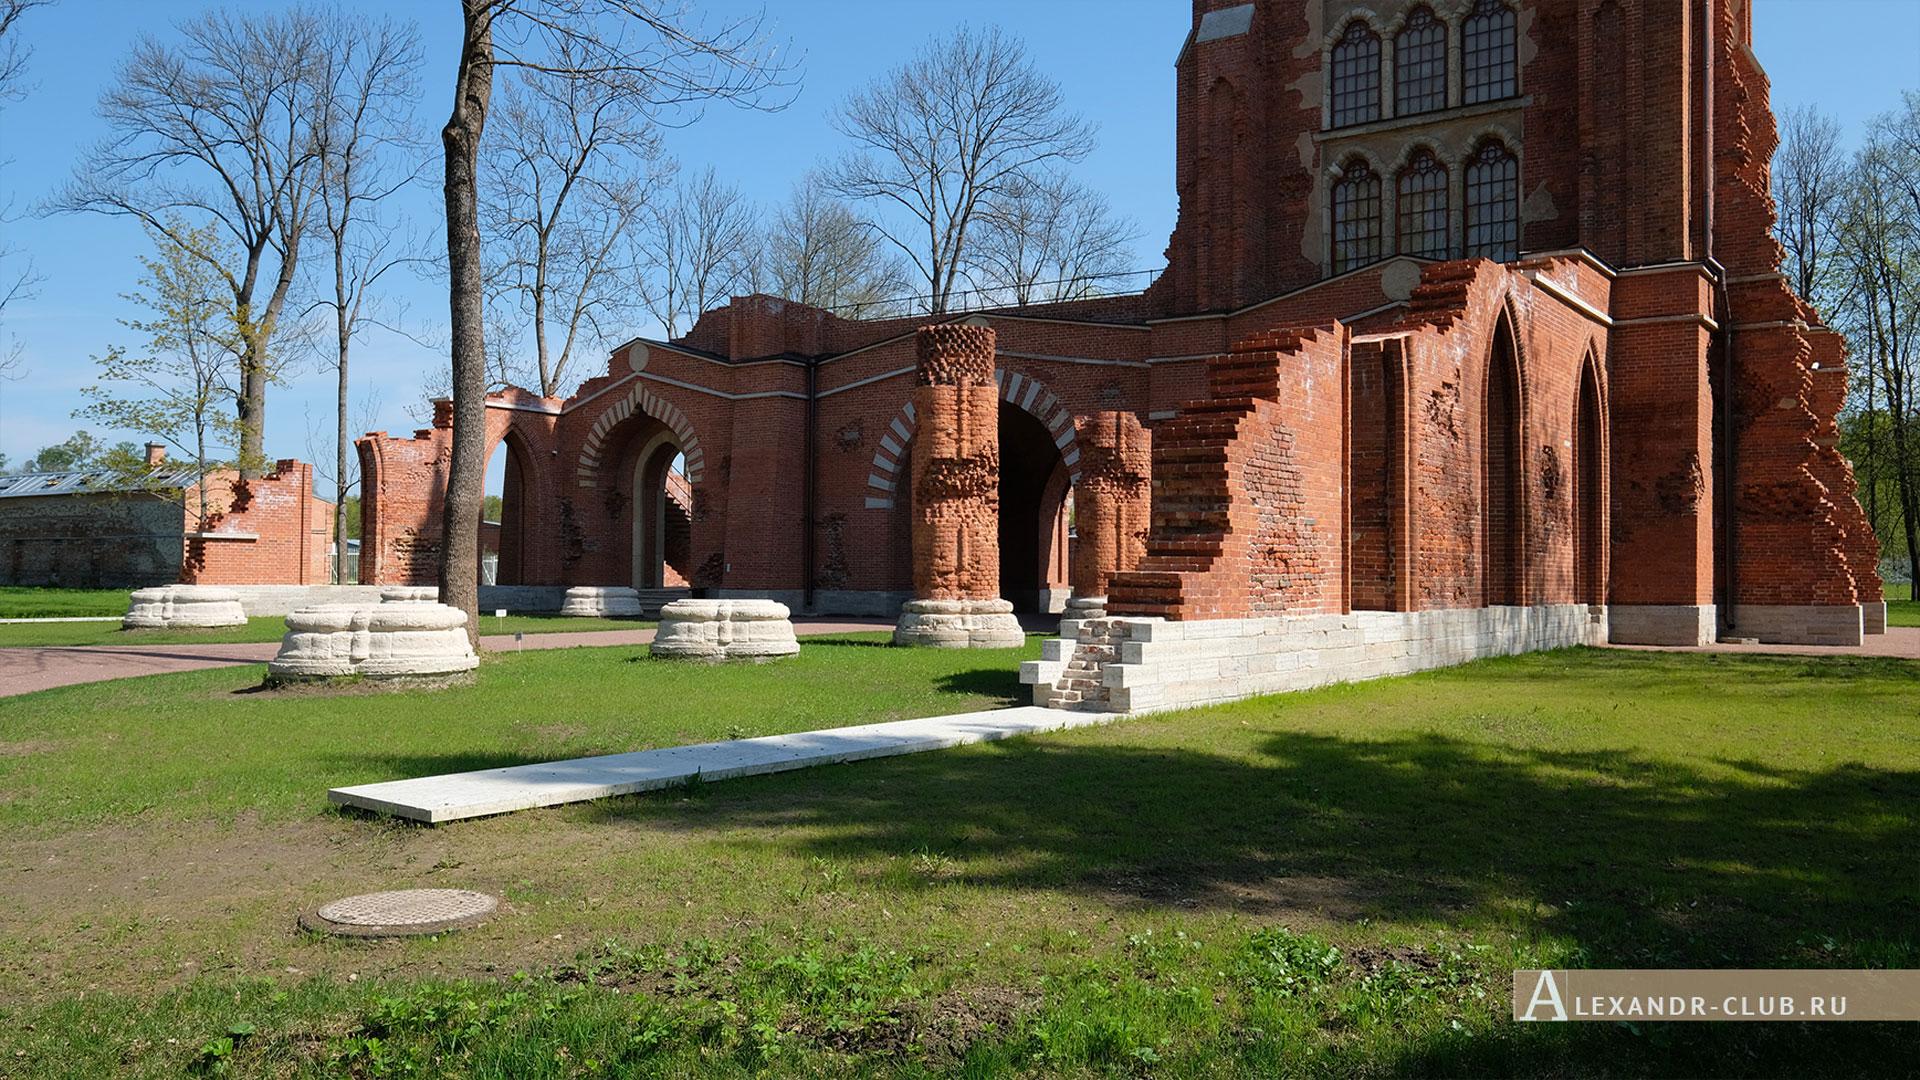 Царское Село, Александровский парк, весна, Шапель